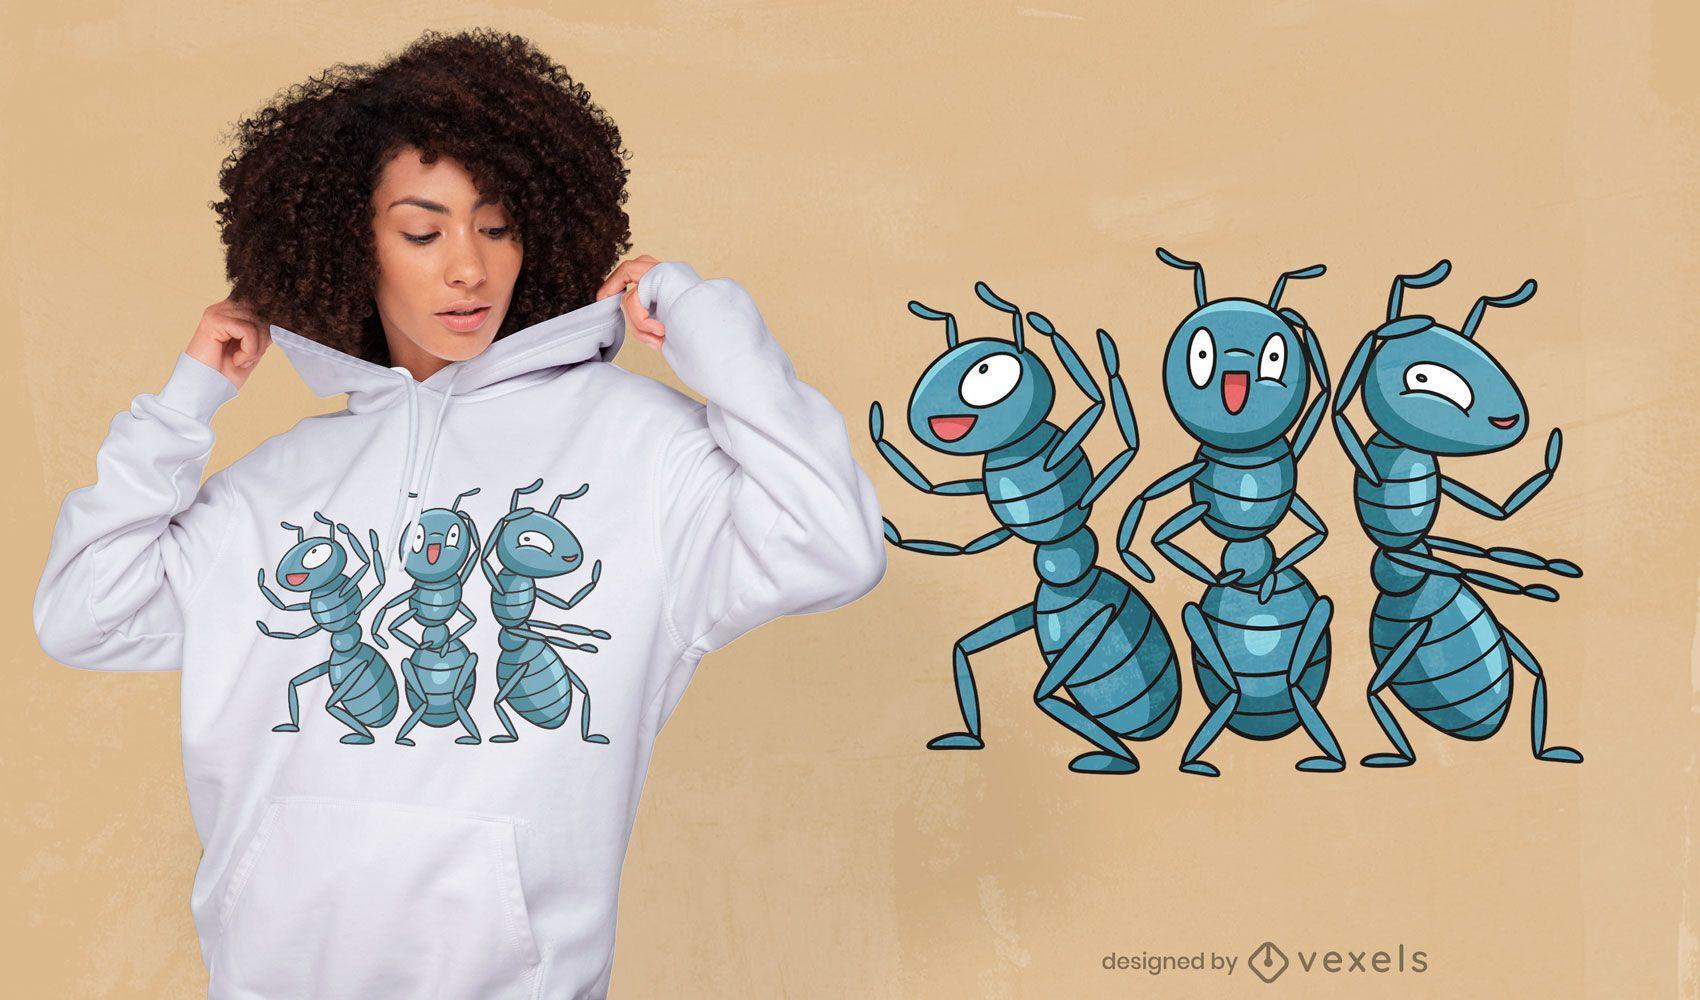 Ant party t-shirt design